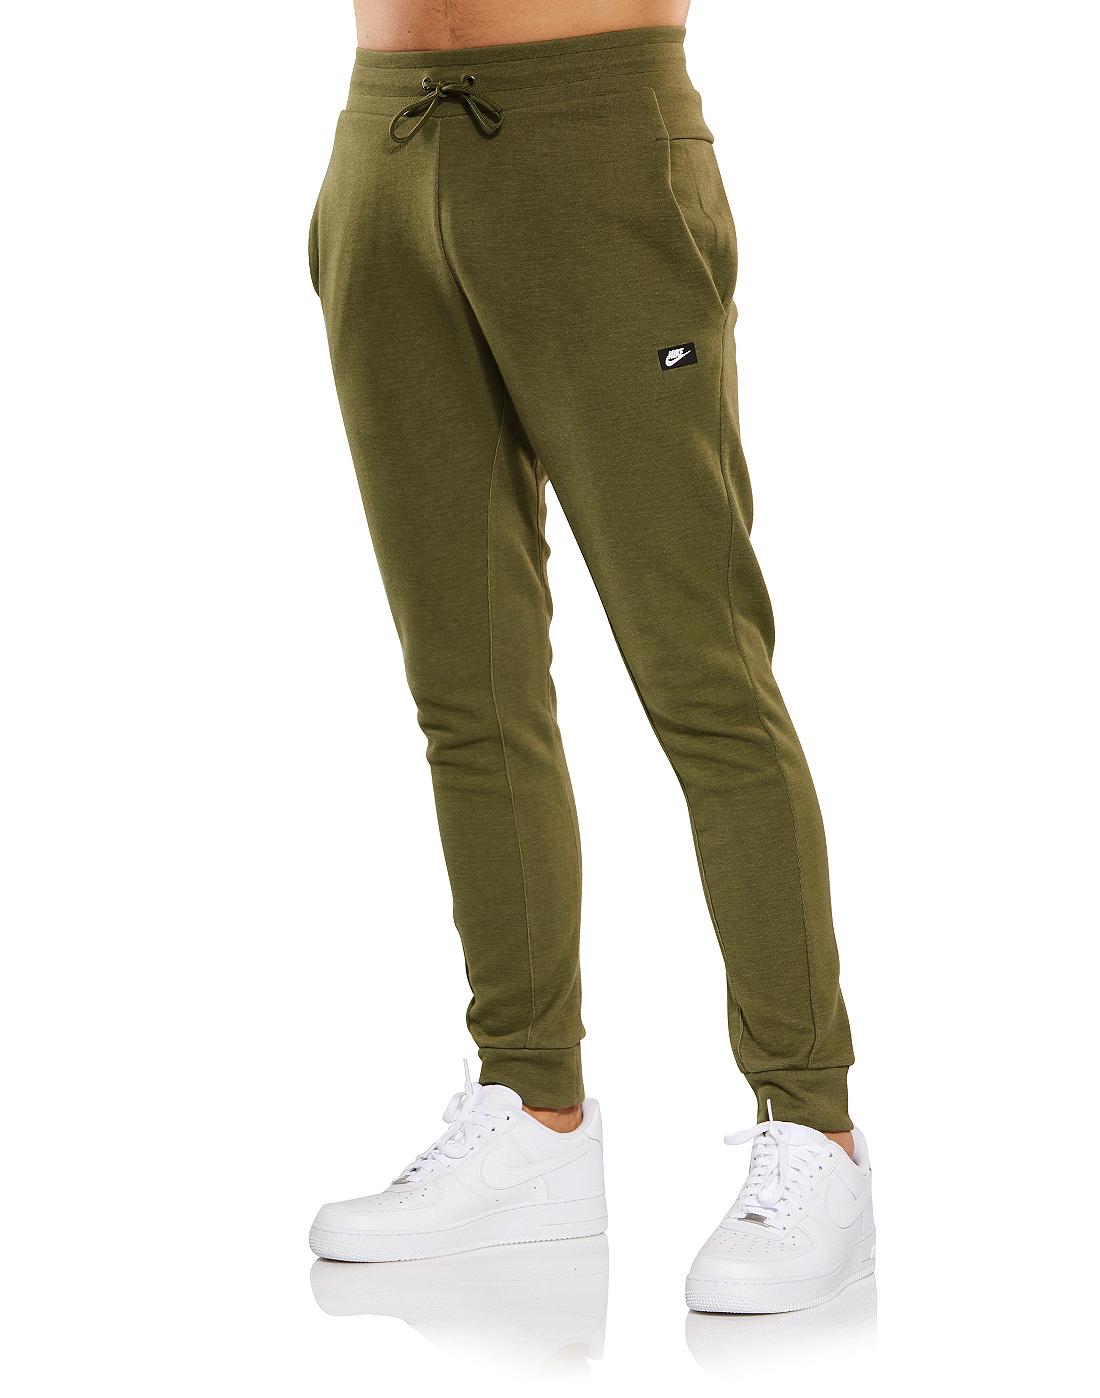 62ff83207d Men's Green Nike Optic Joggers   Life Style Sports